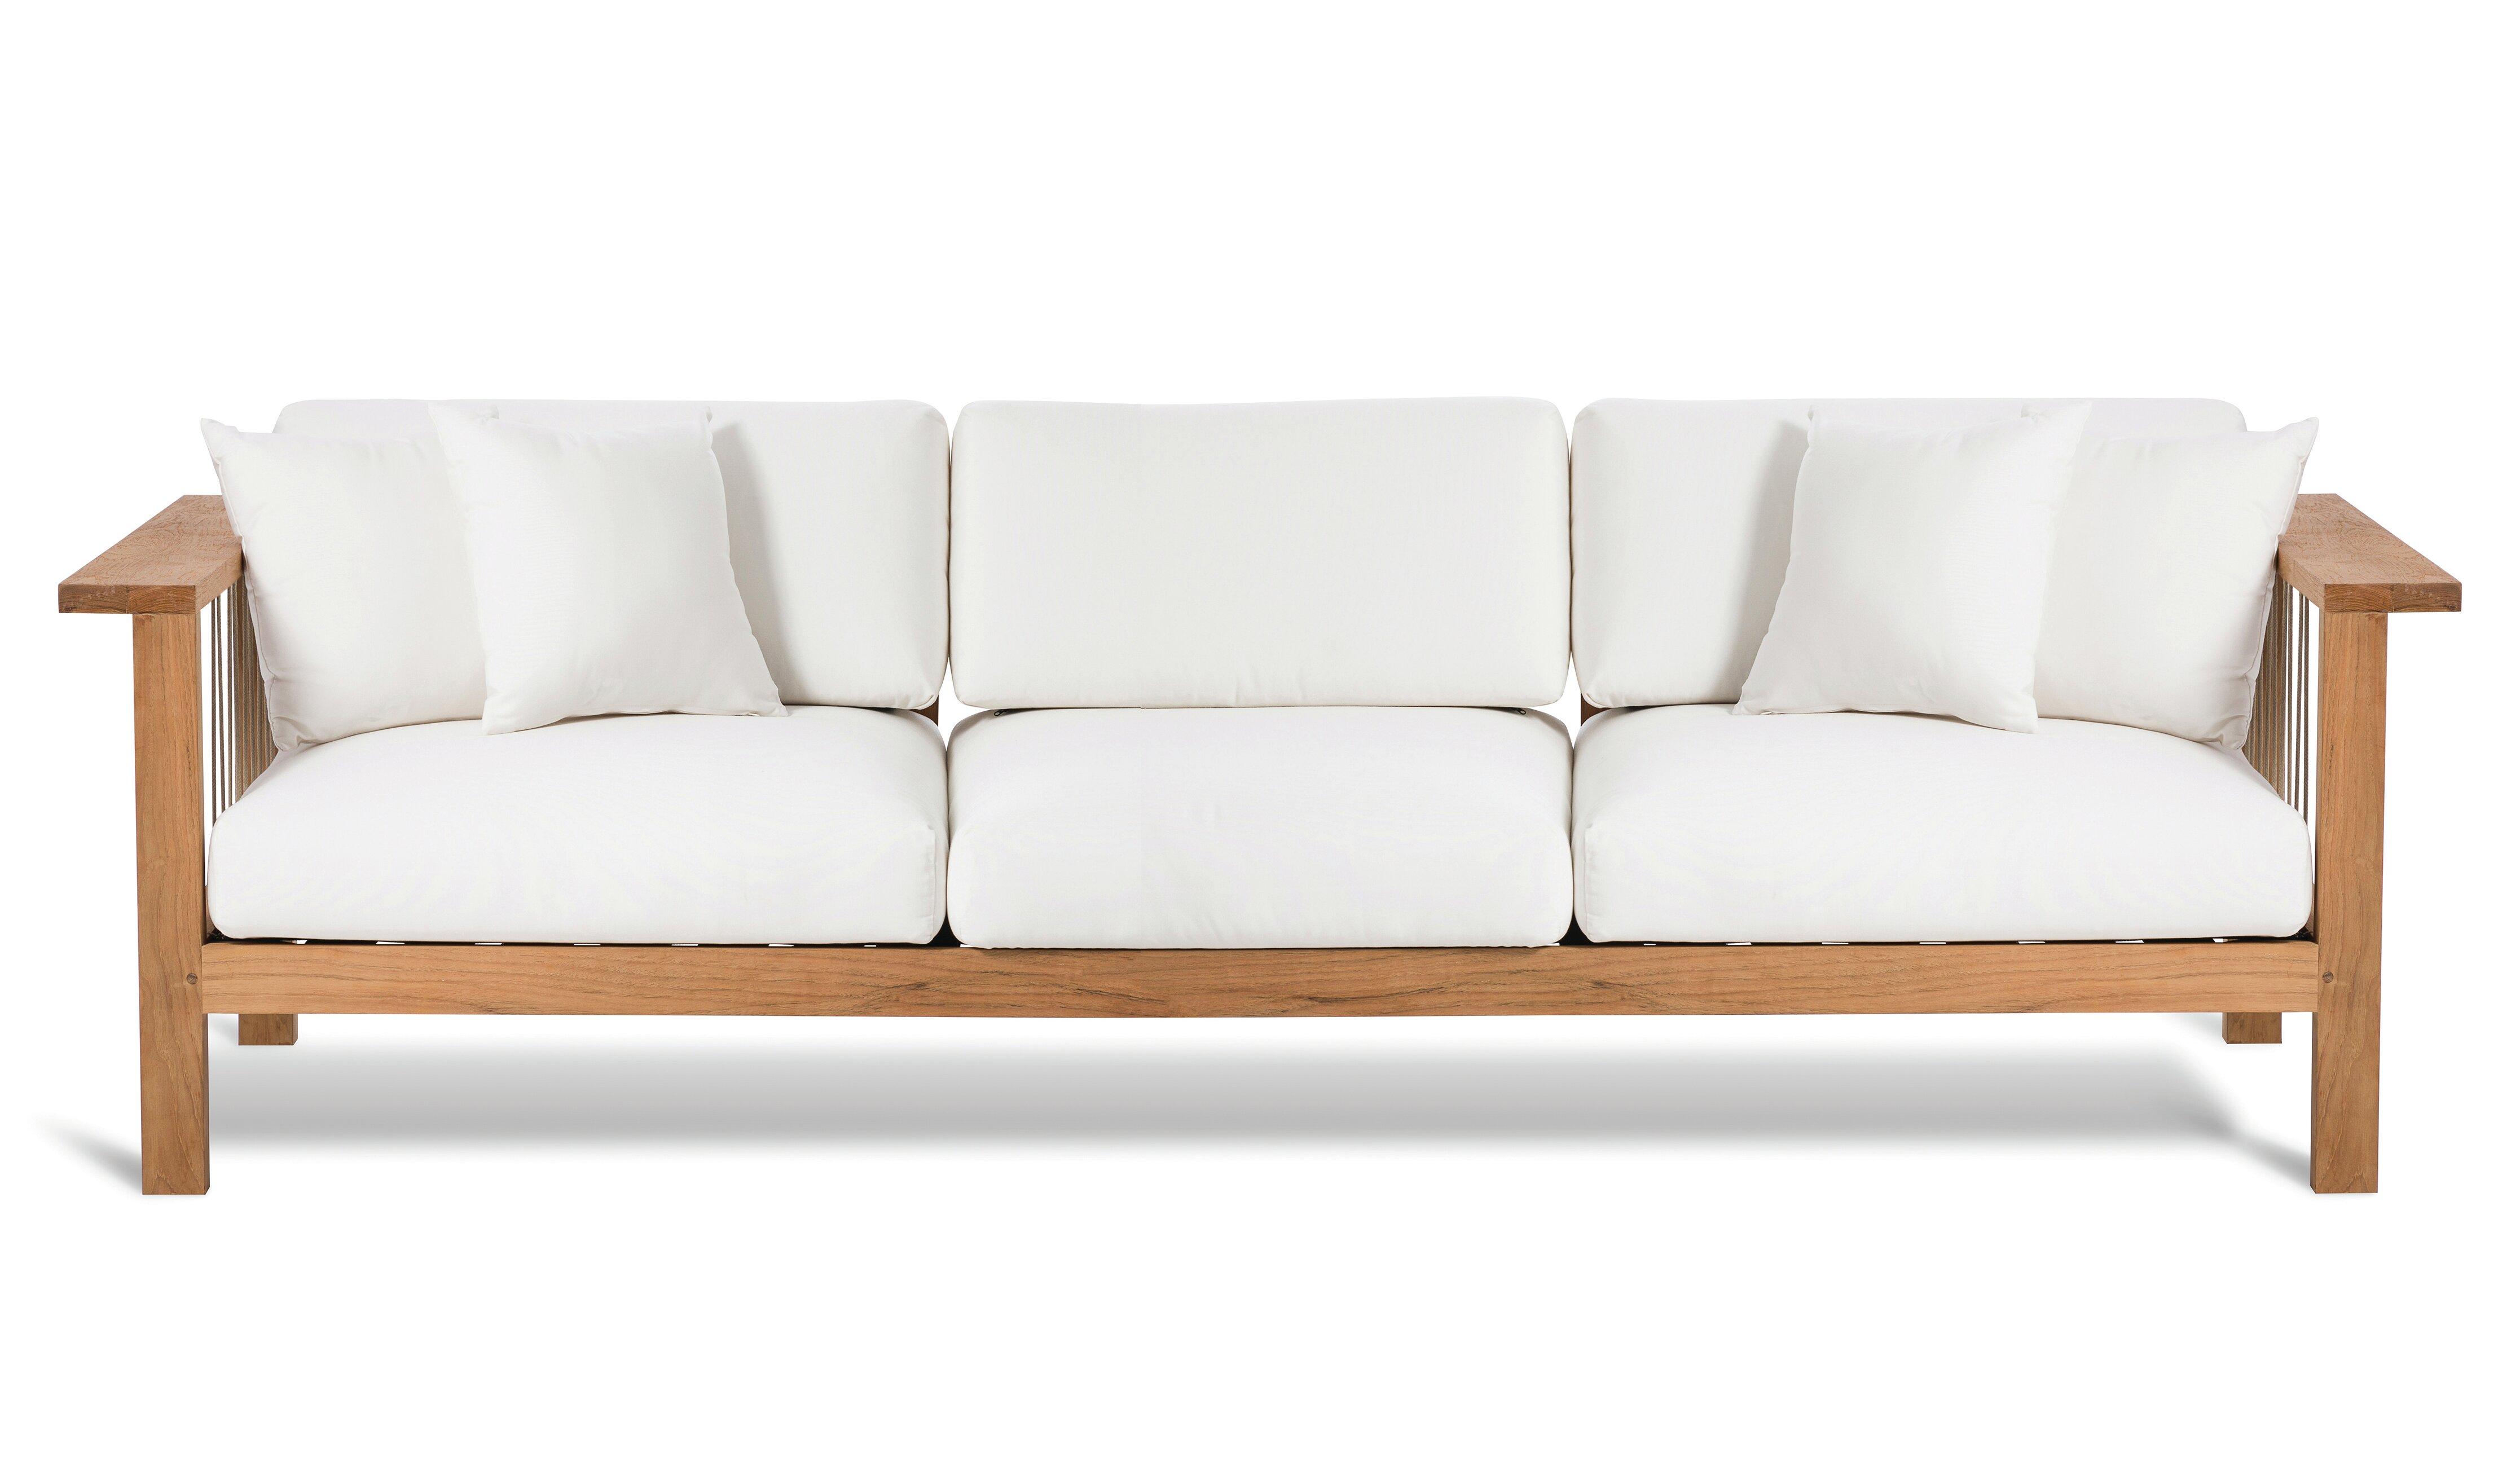 Maro Teak Patio Sofa With Sunbrella